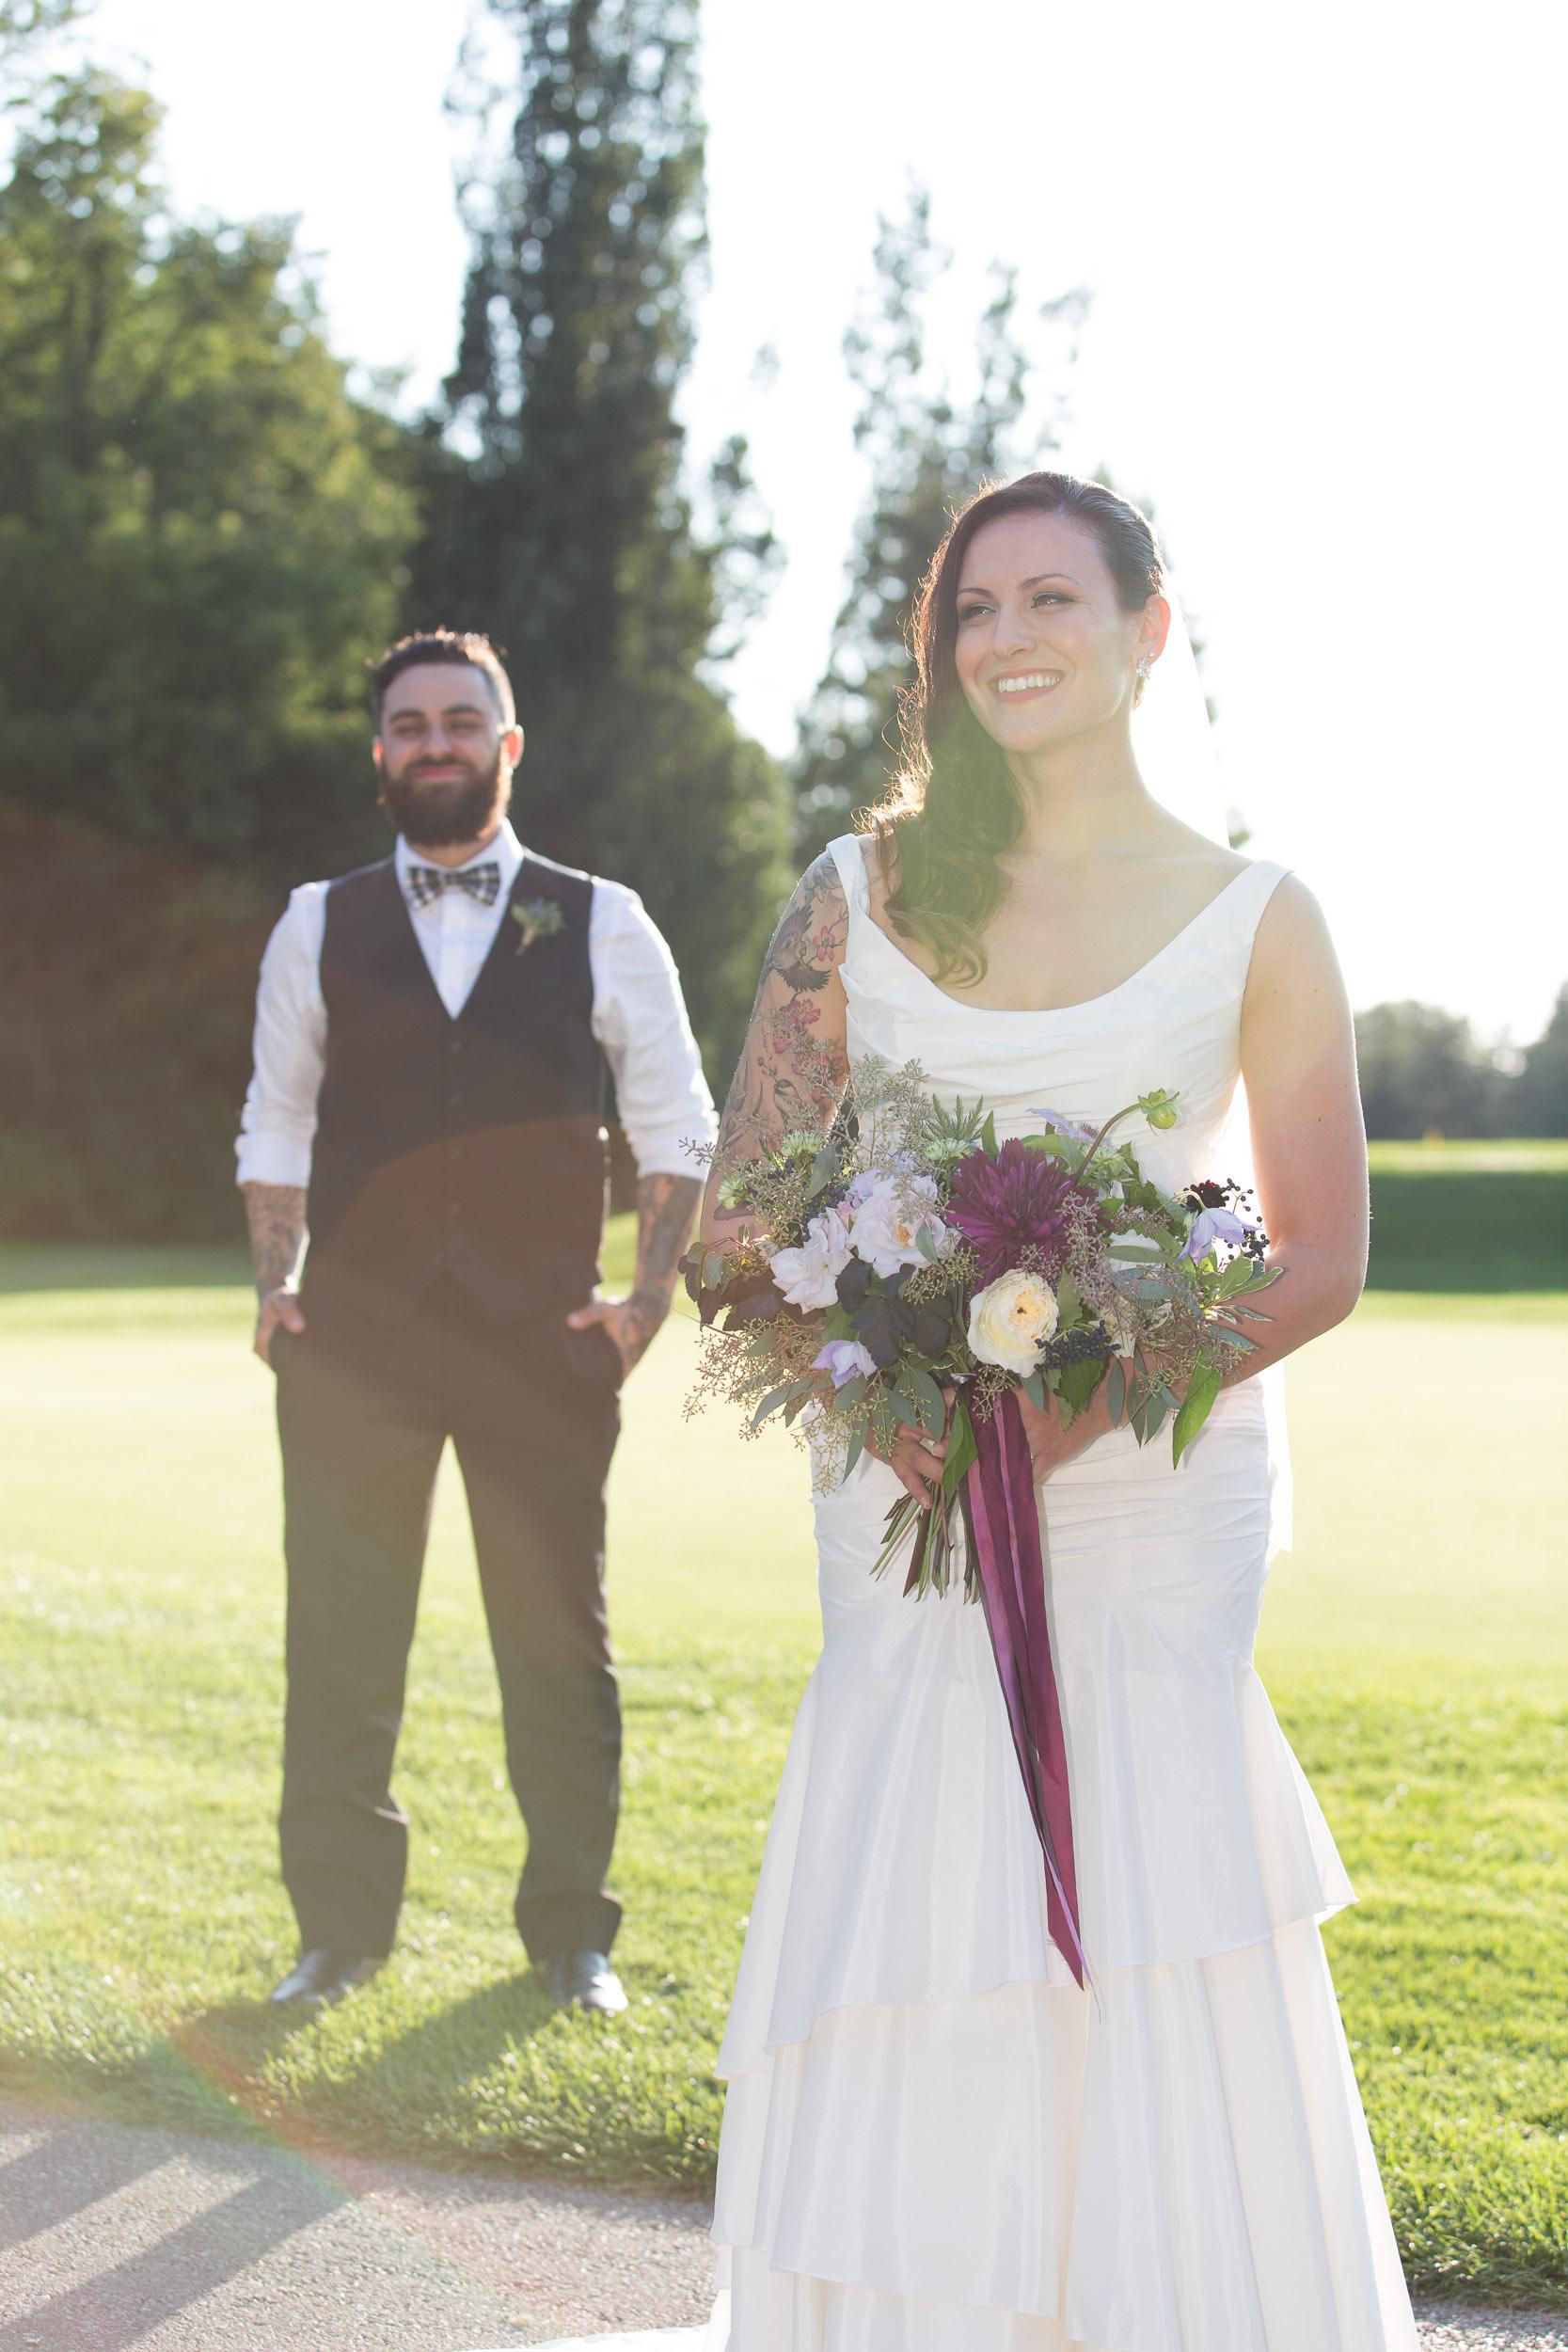 Andrew and Alicia wedding-108.jpg